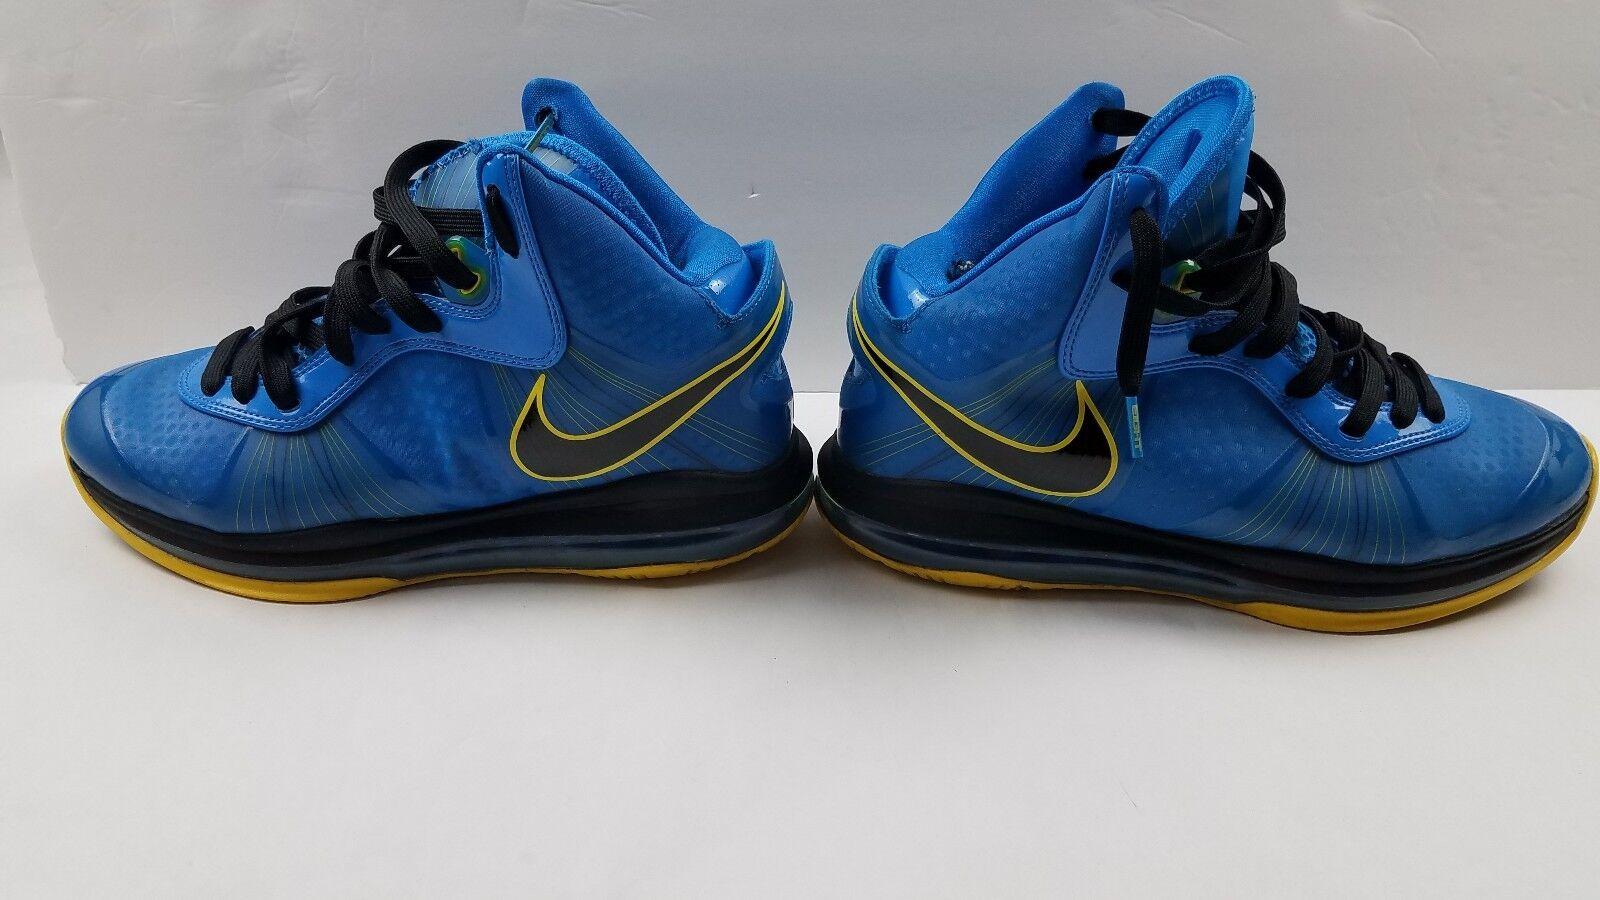 Nike Air Max lebron 8 V 2 Size 9 Entourage Rare 429676-401